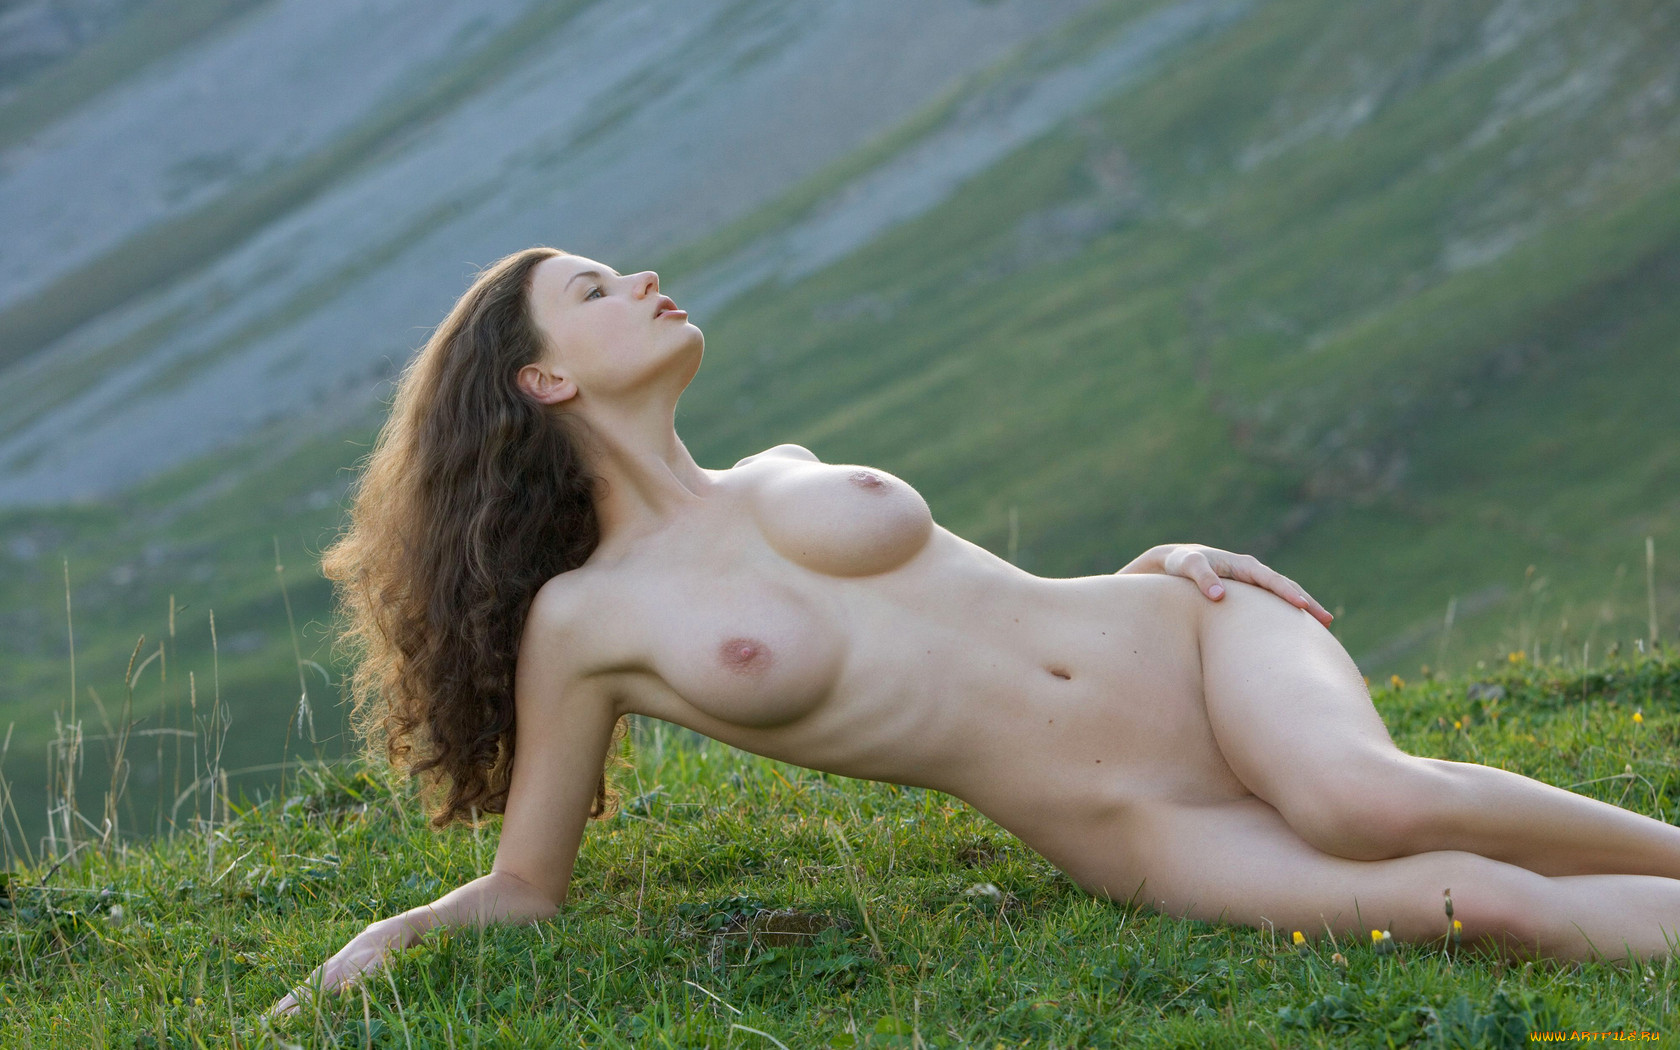 Шатенка голая на природе 20 фотография